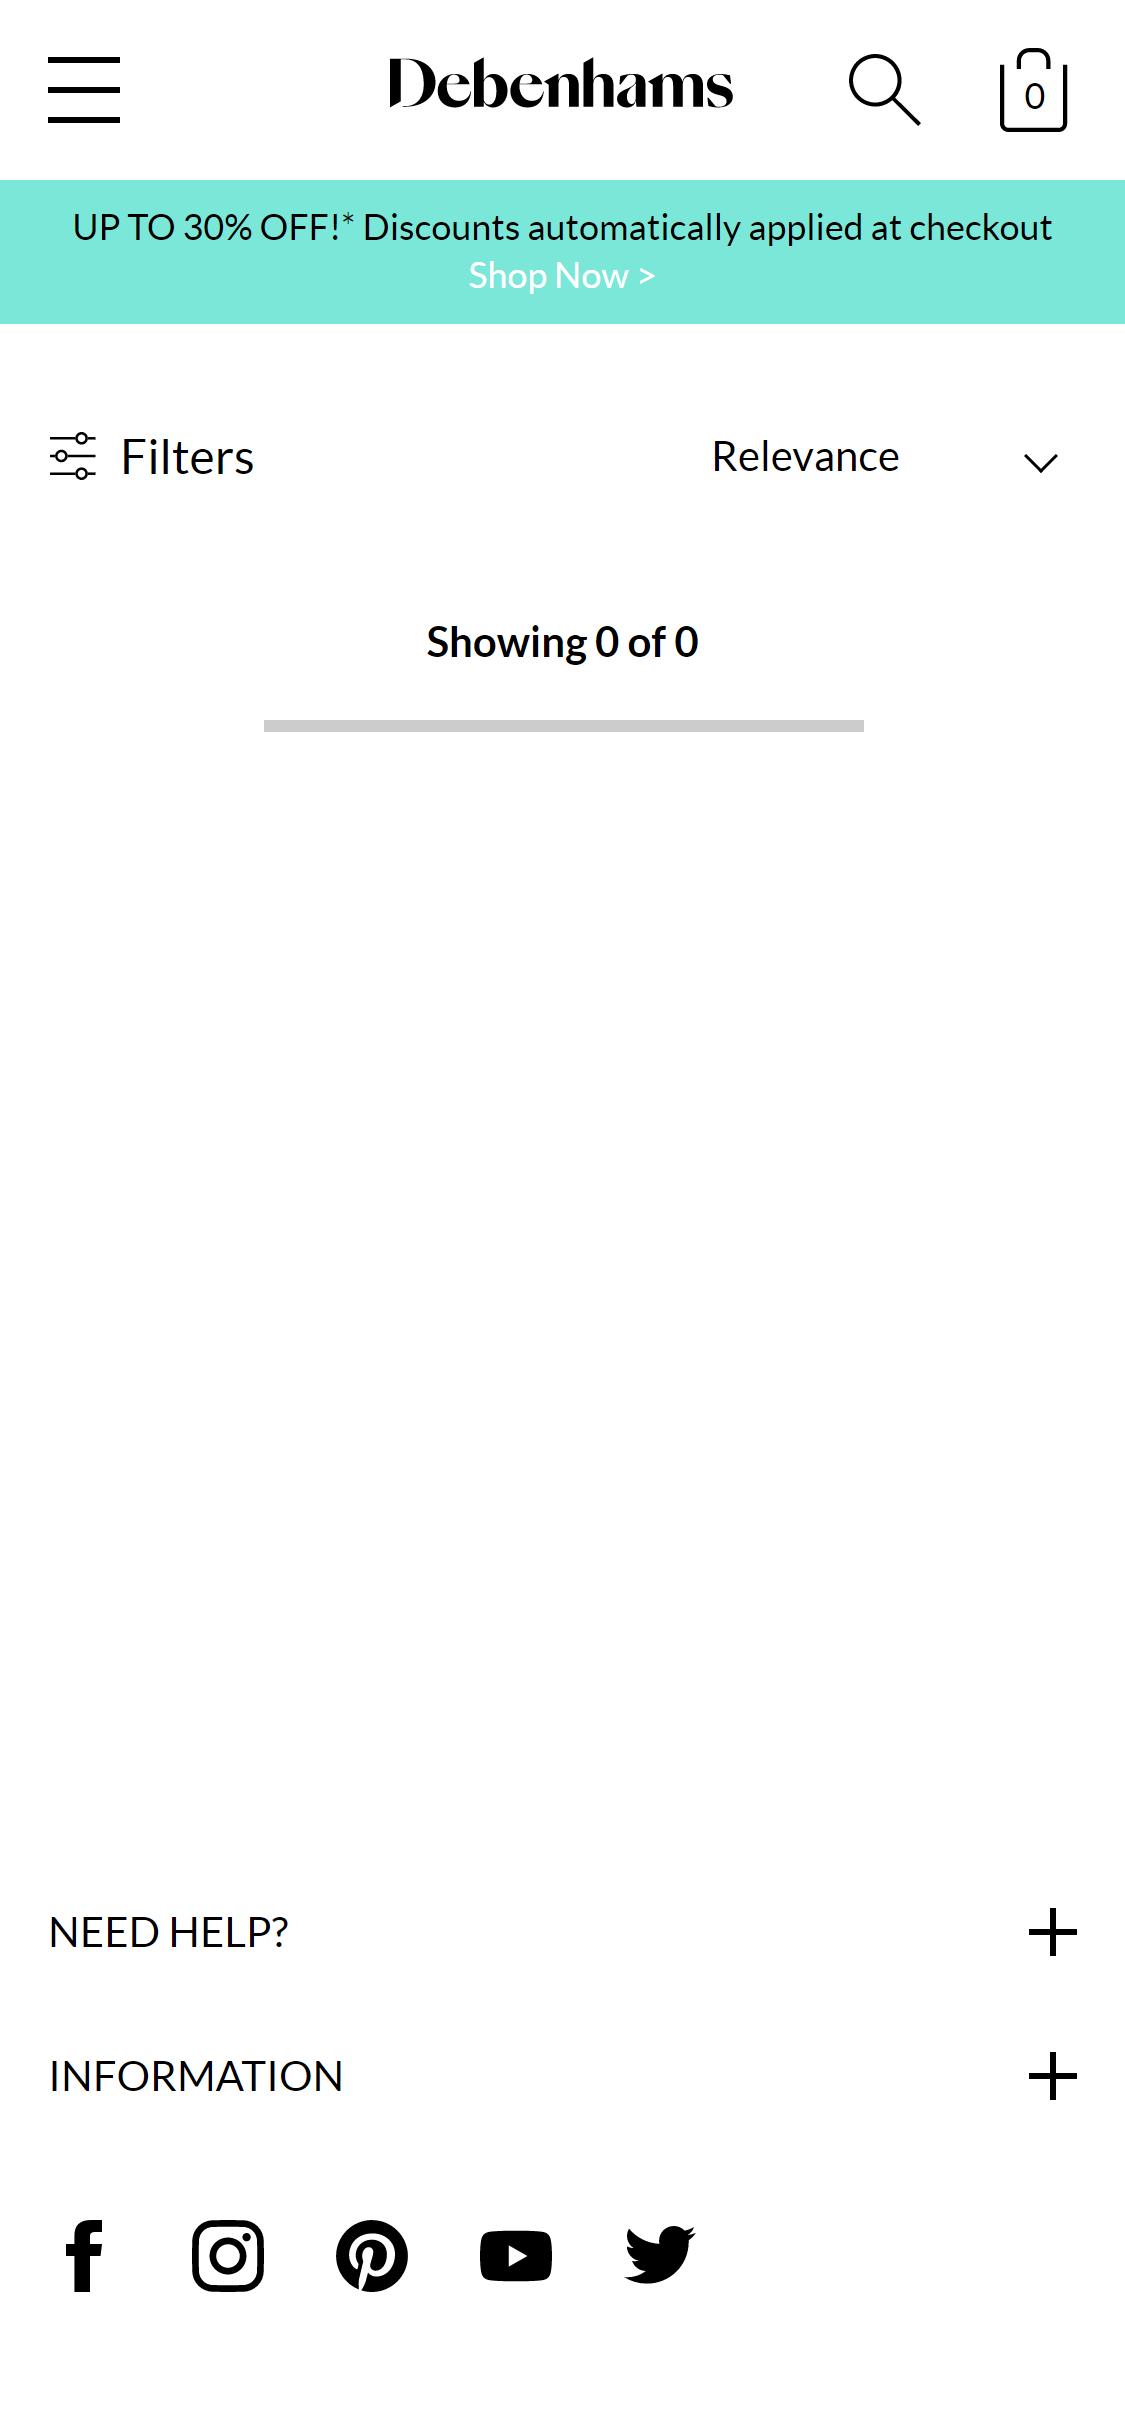 debenhams.com empty landing pages.